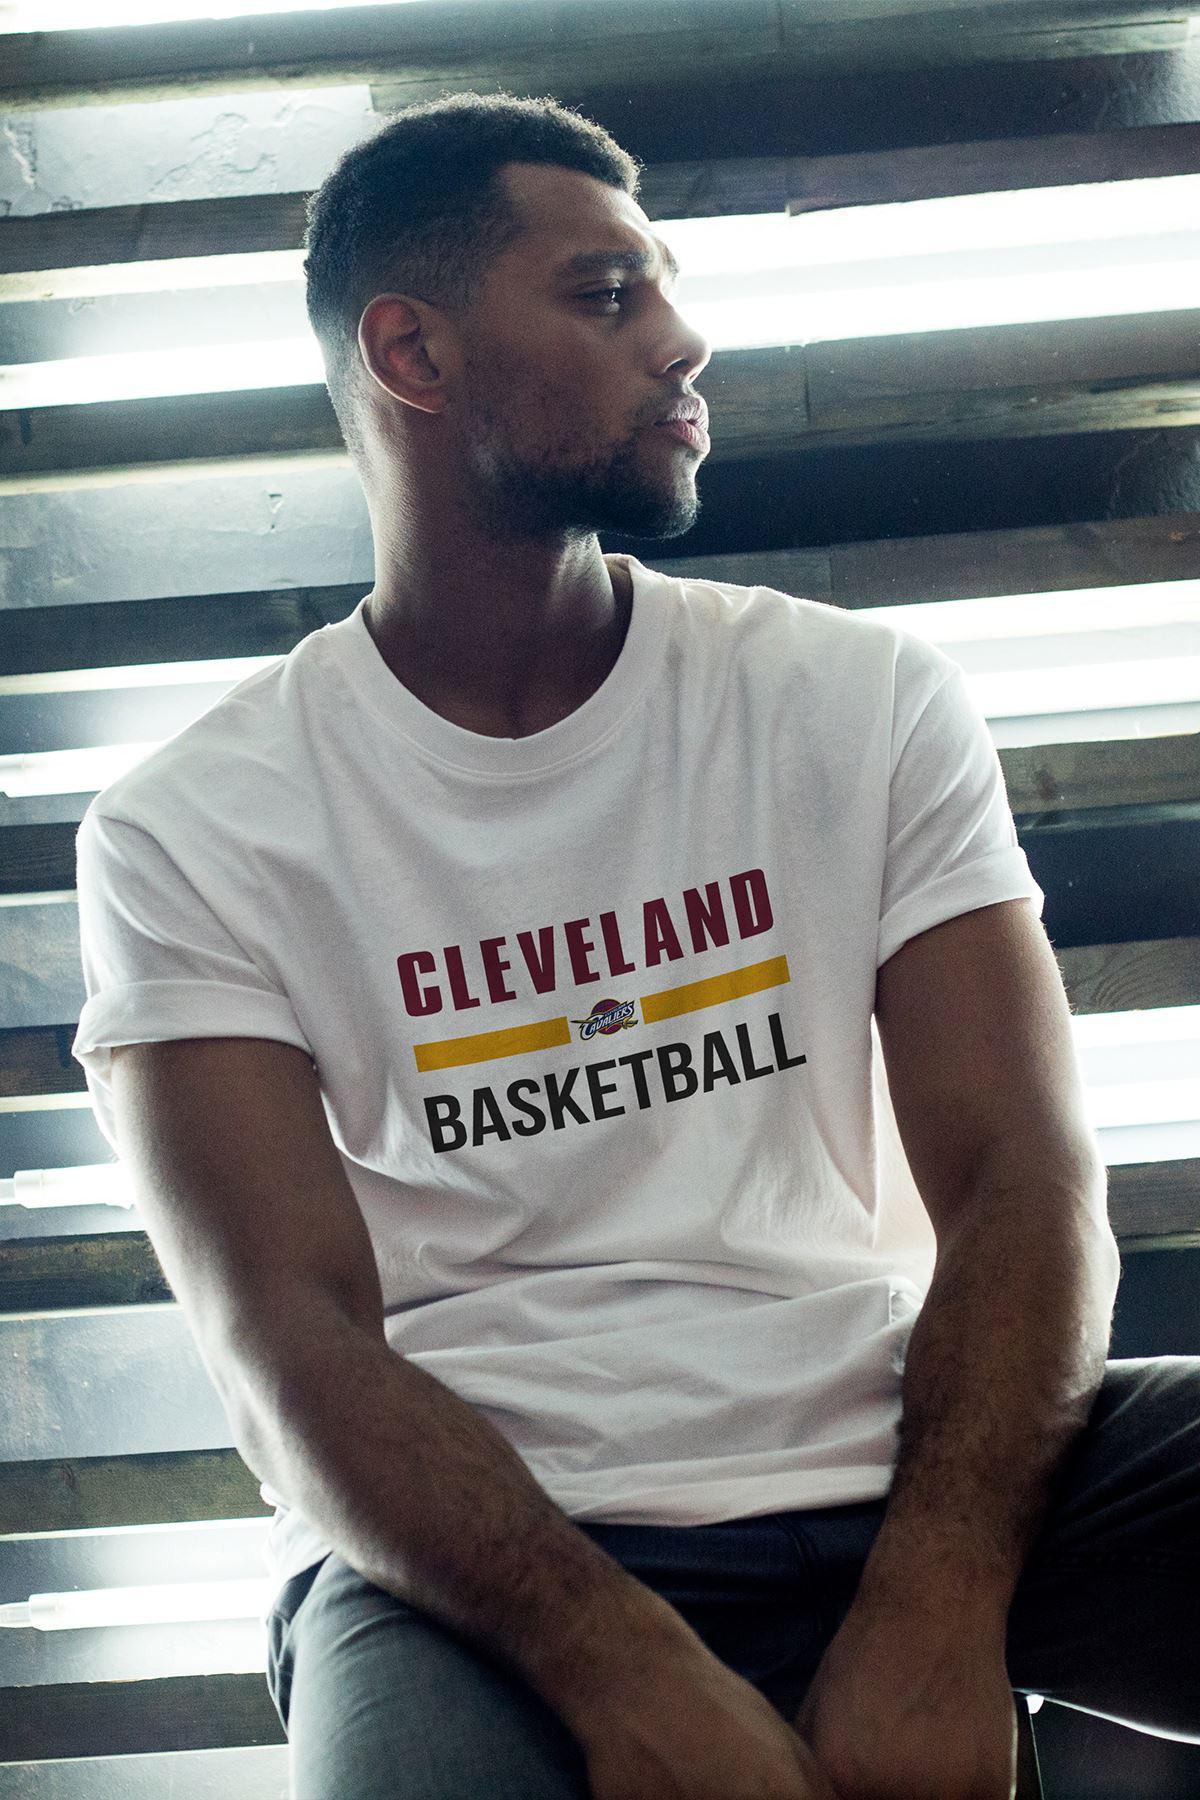 Cleveland 05 Beyaz Erkek Oversize Tshirt - Tişört